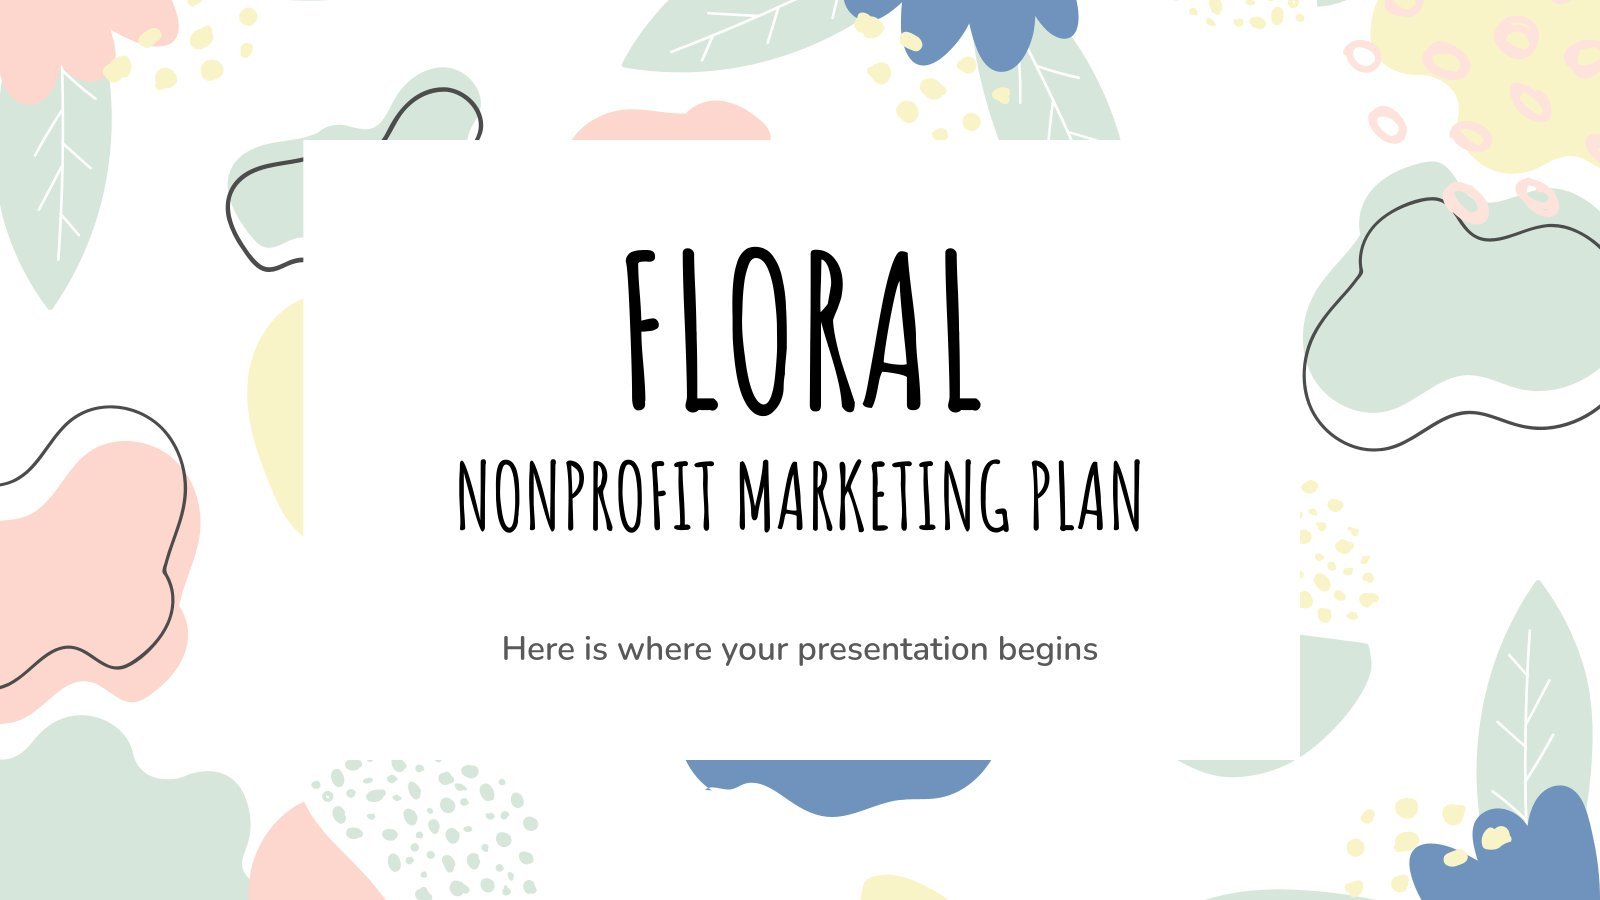 Floral Nonprofit Marketing Plan presentation template